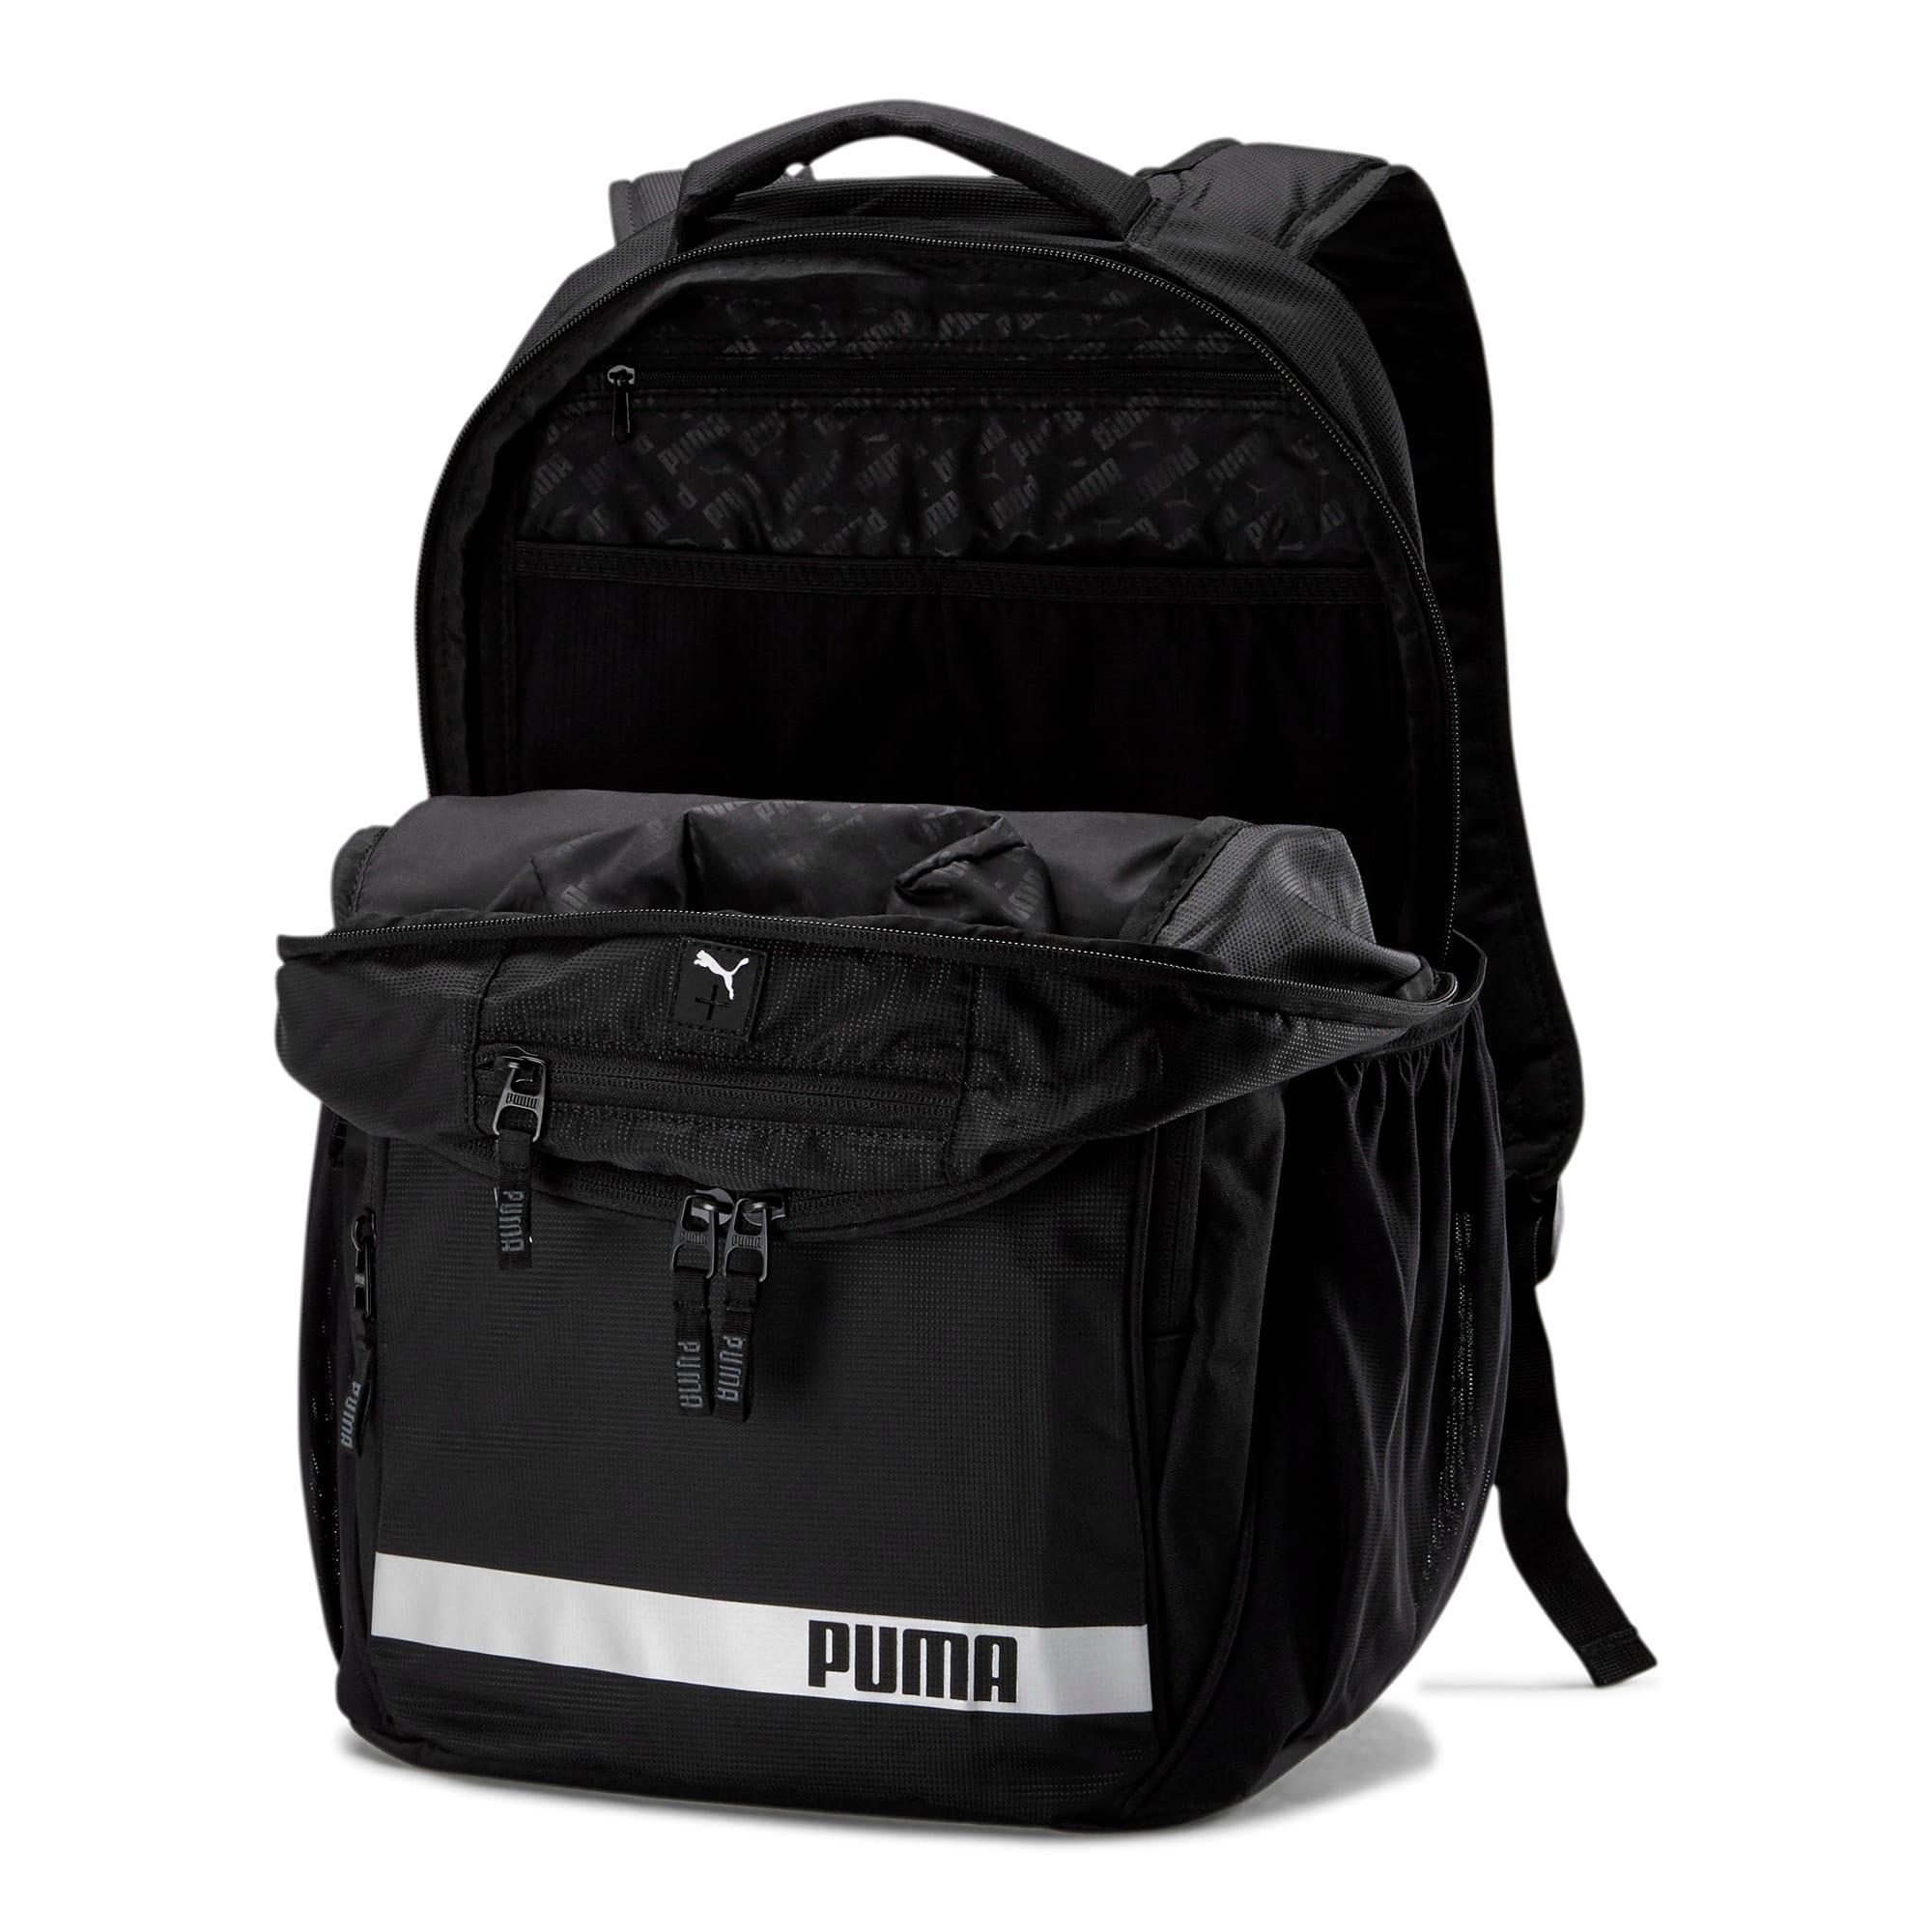 Thumbnail 3 of Formation 2.0 Ball Backpack, Black, medium